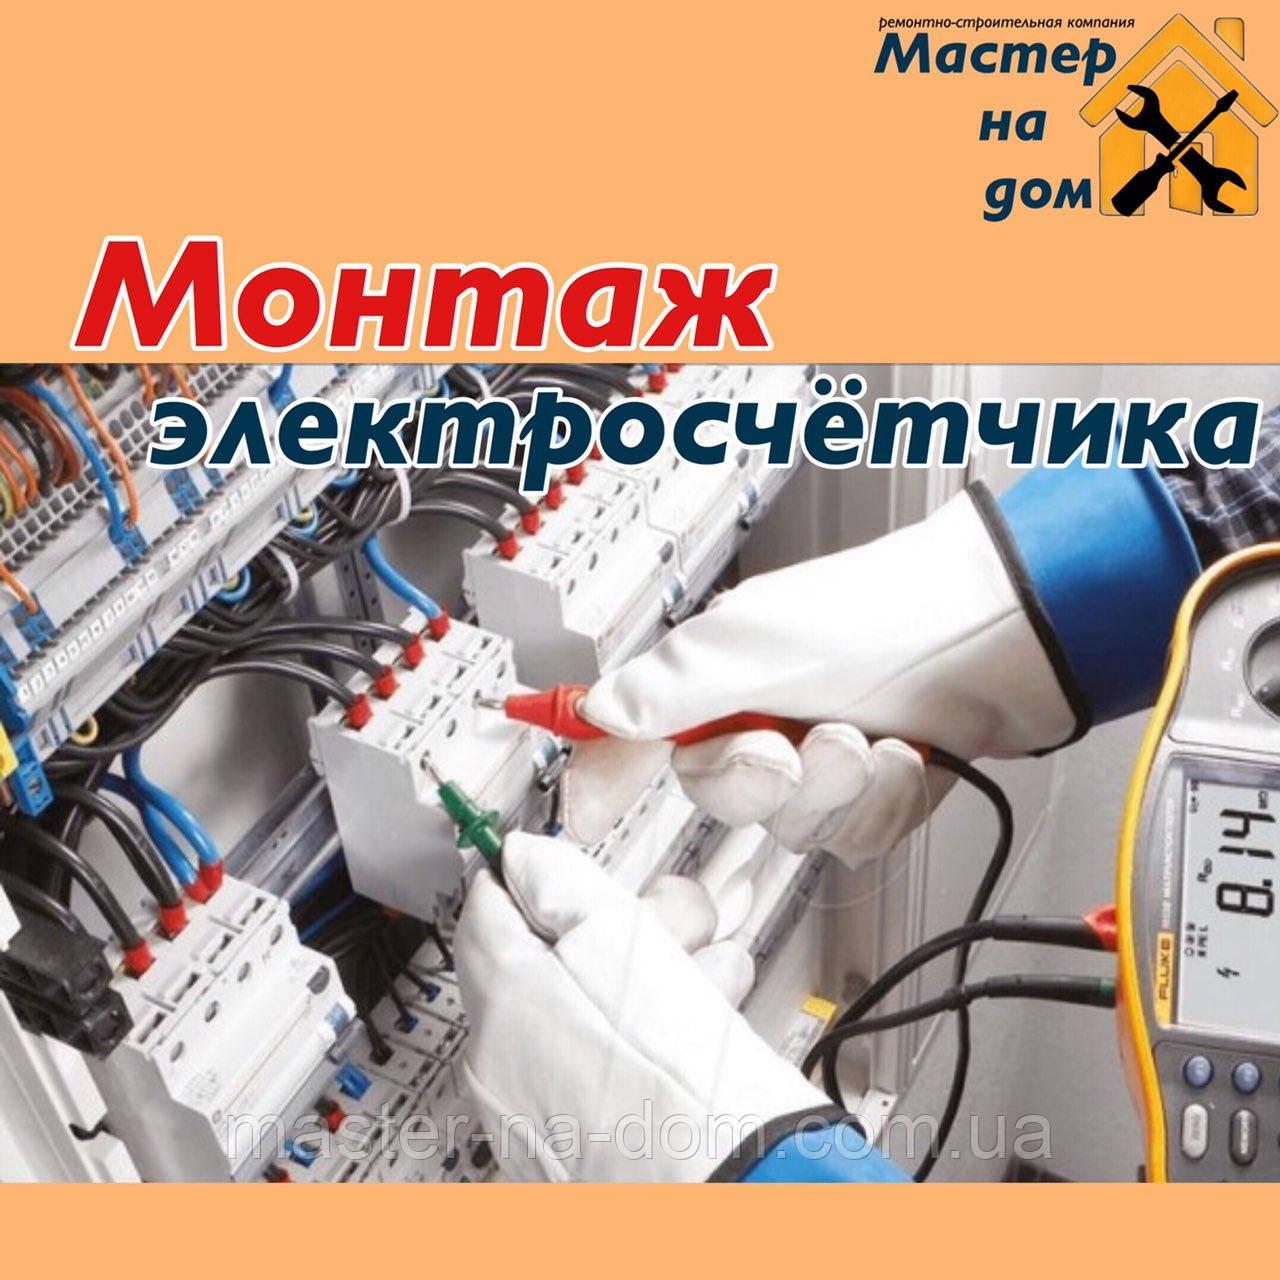 Монтаж электросчётчиков в Житомире